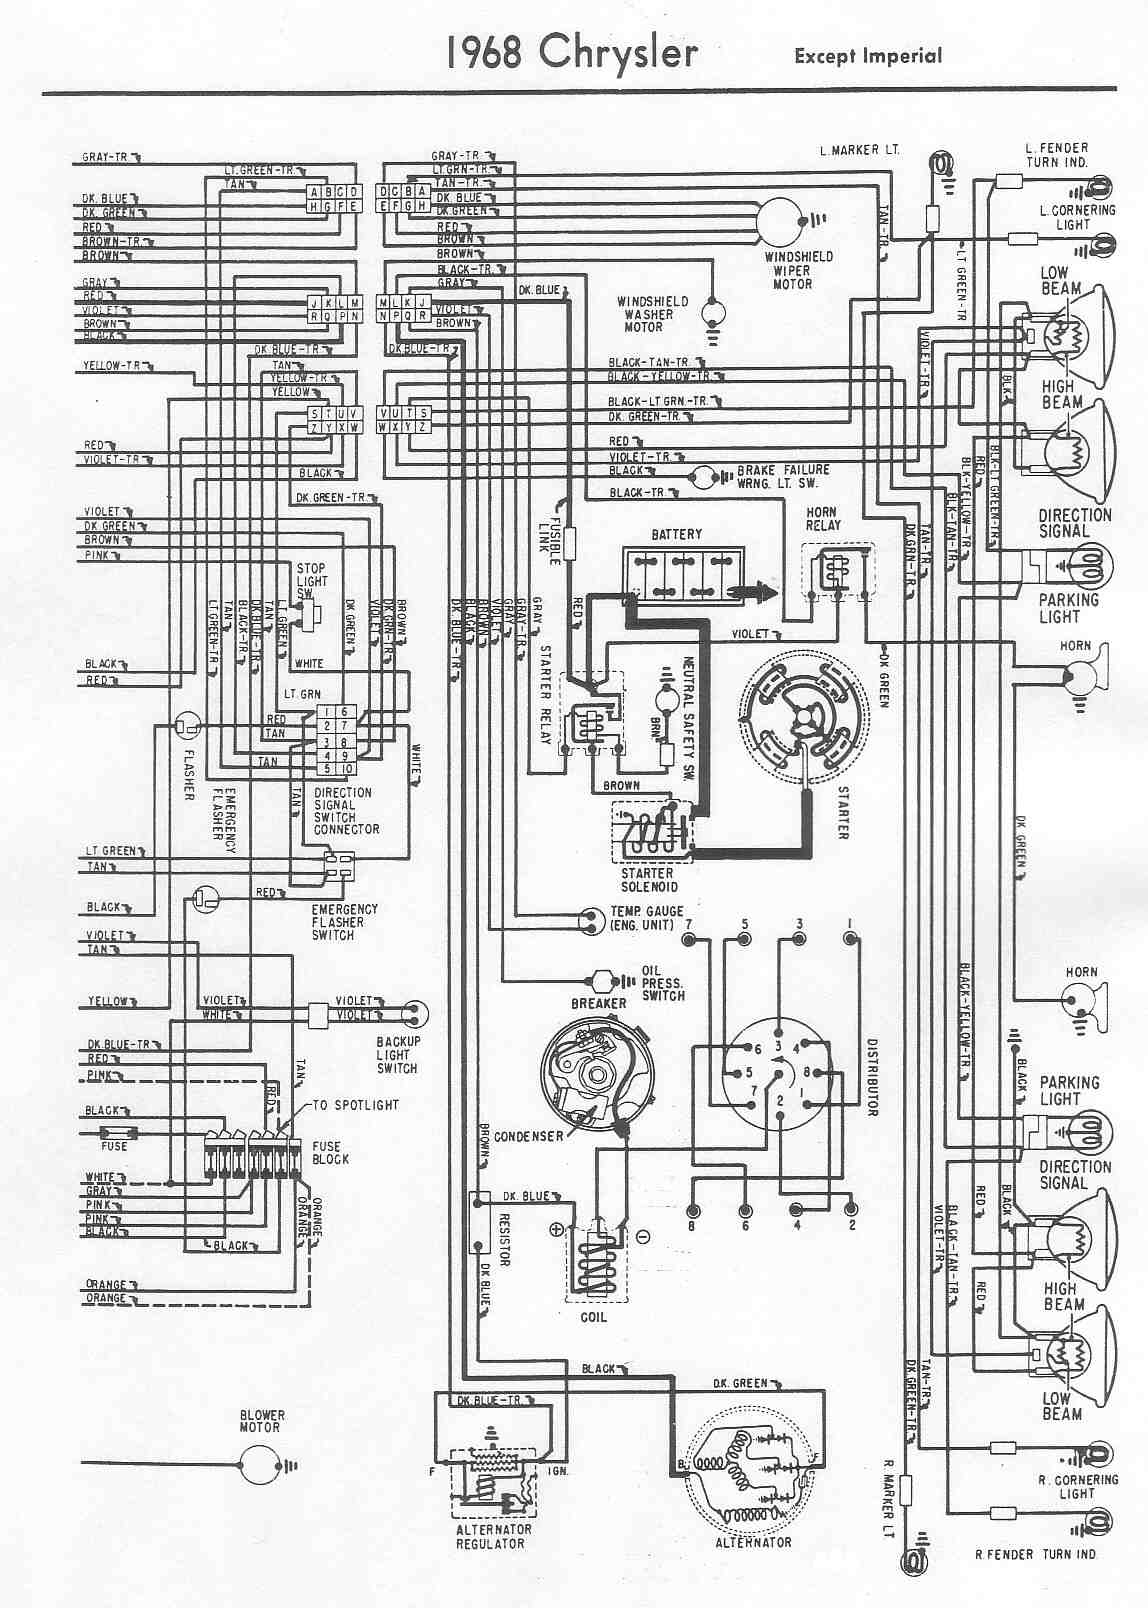 hight resolution of 1965 dodge coronet wiring diagram wiring diagram third level rh 10 12 12 jacobwinterstein com 1970